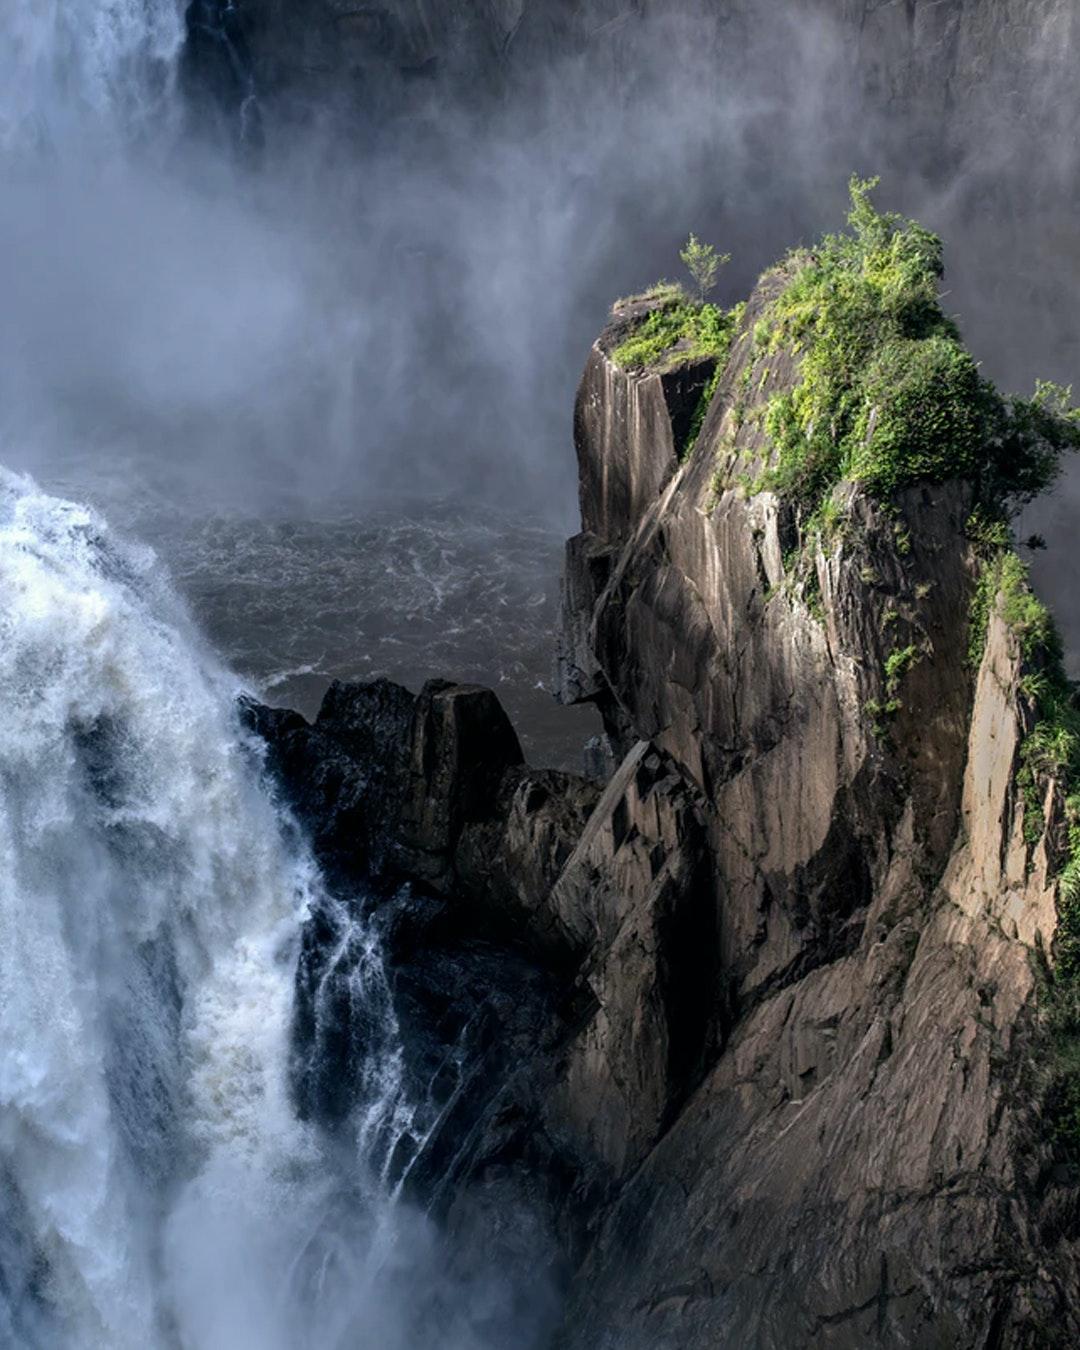 mist surrounding the bottom of barron falls